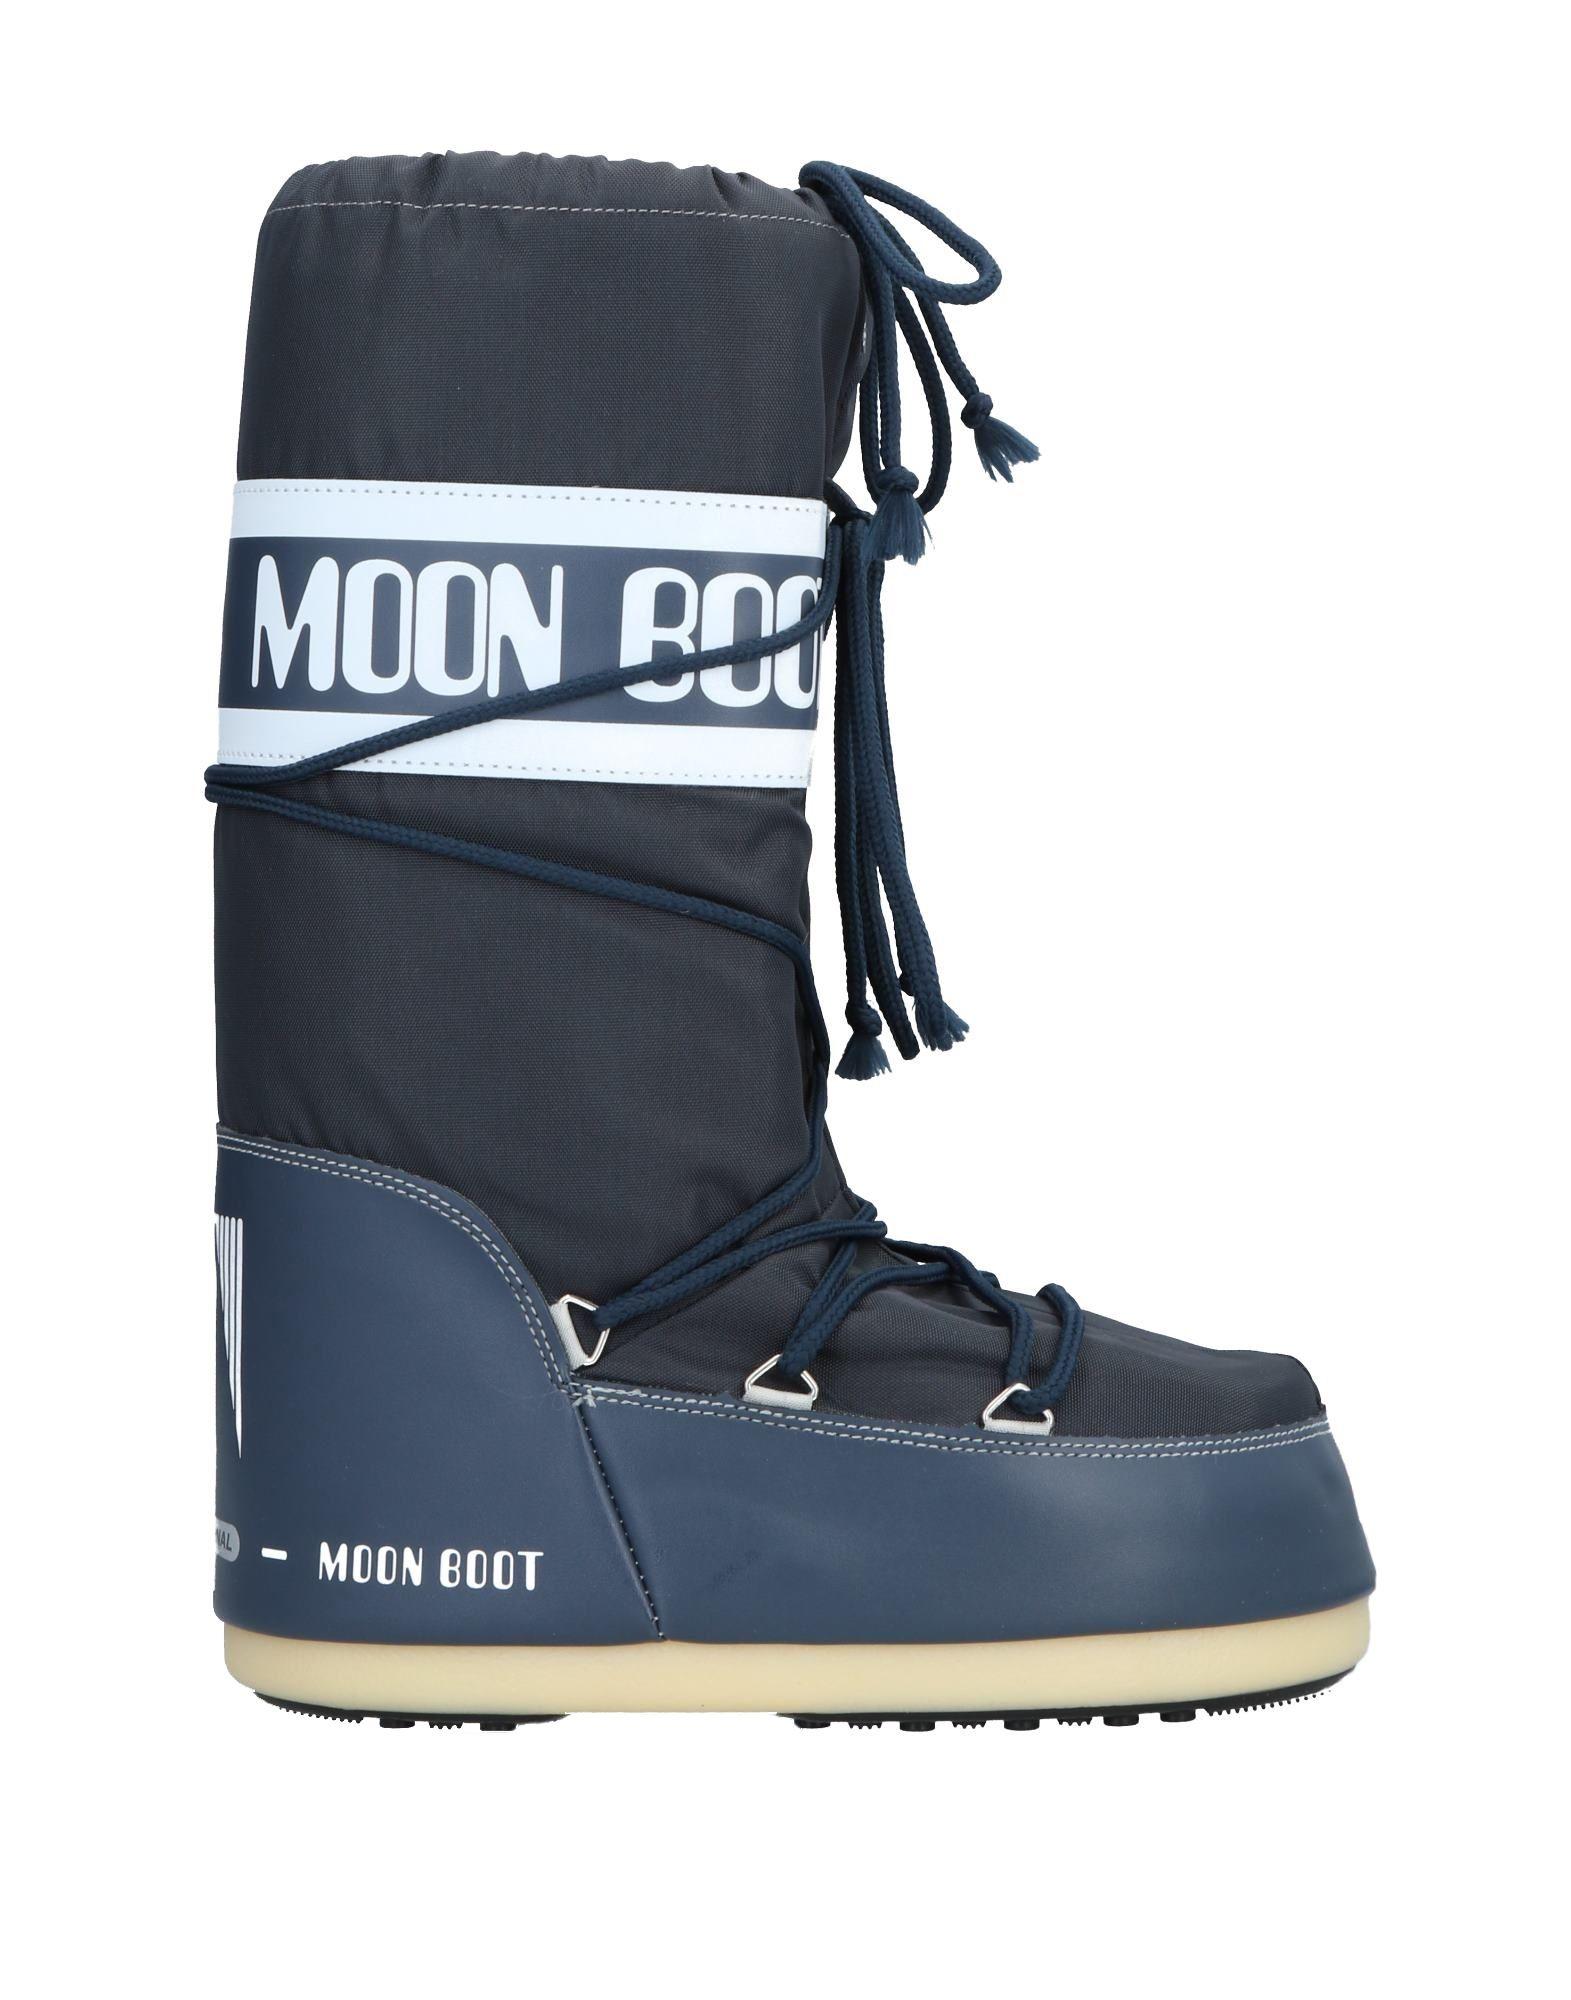 Moon Boot Stiefel Damen  11544334NN Gute Qualität beliebte Schuhe